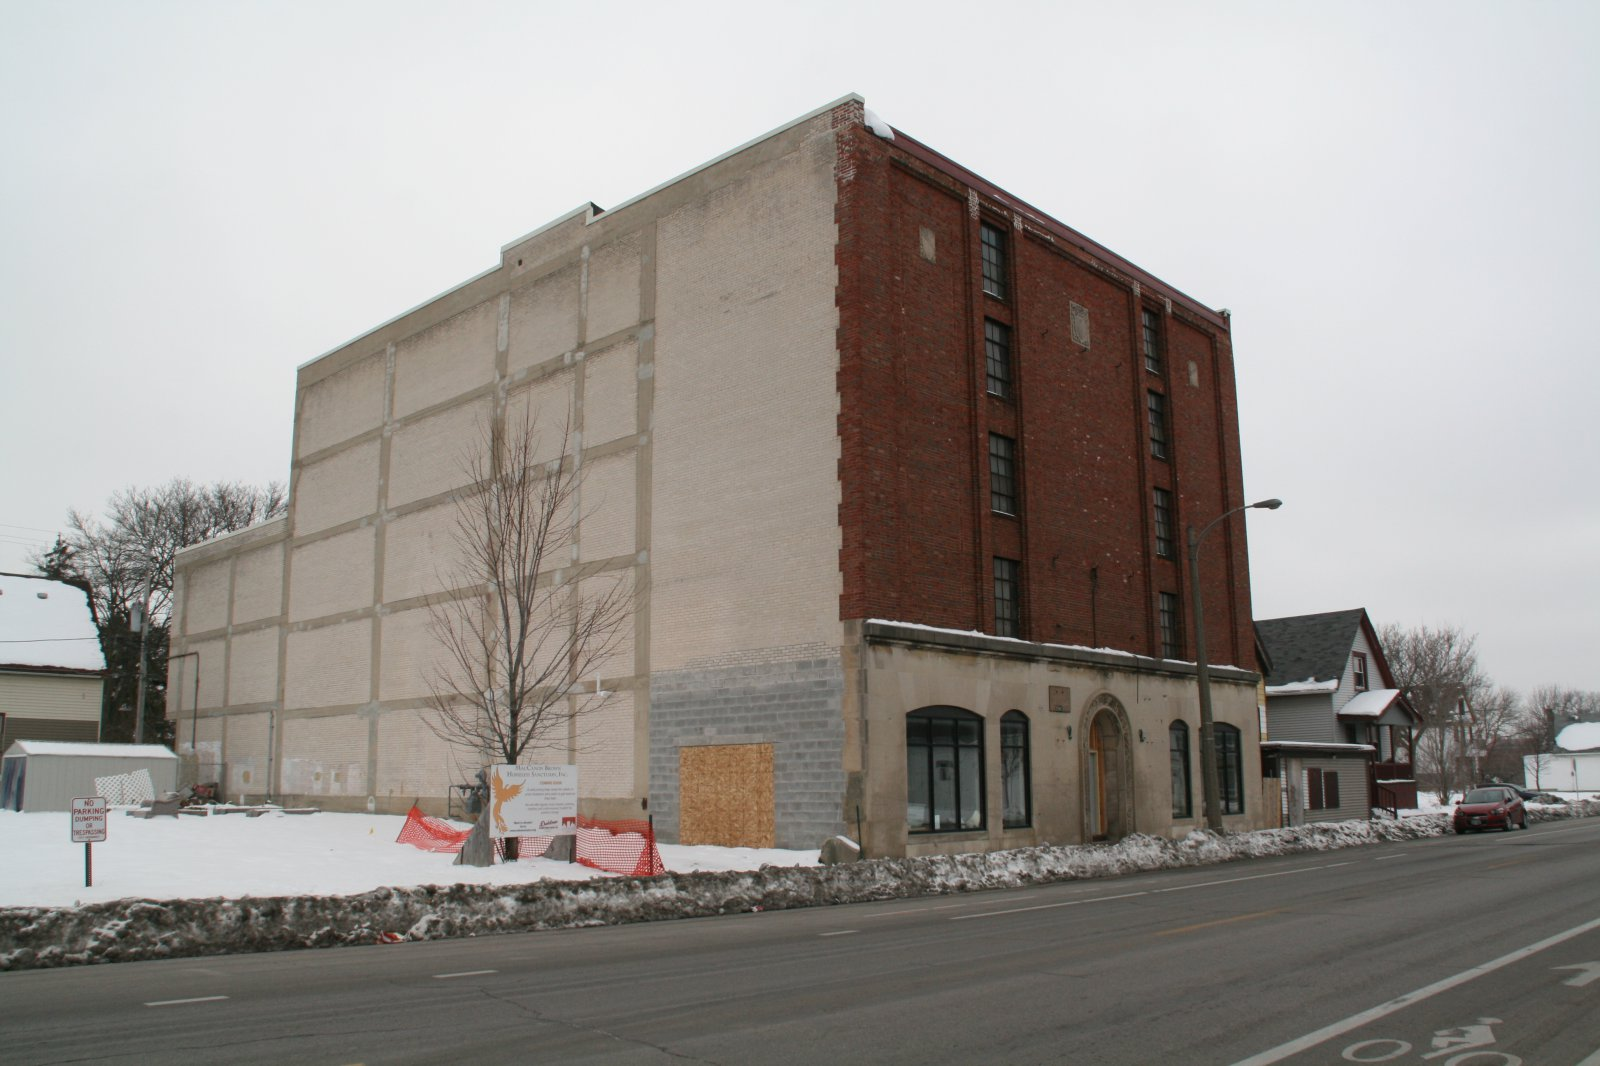 2461 W. Center St.